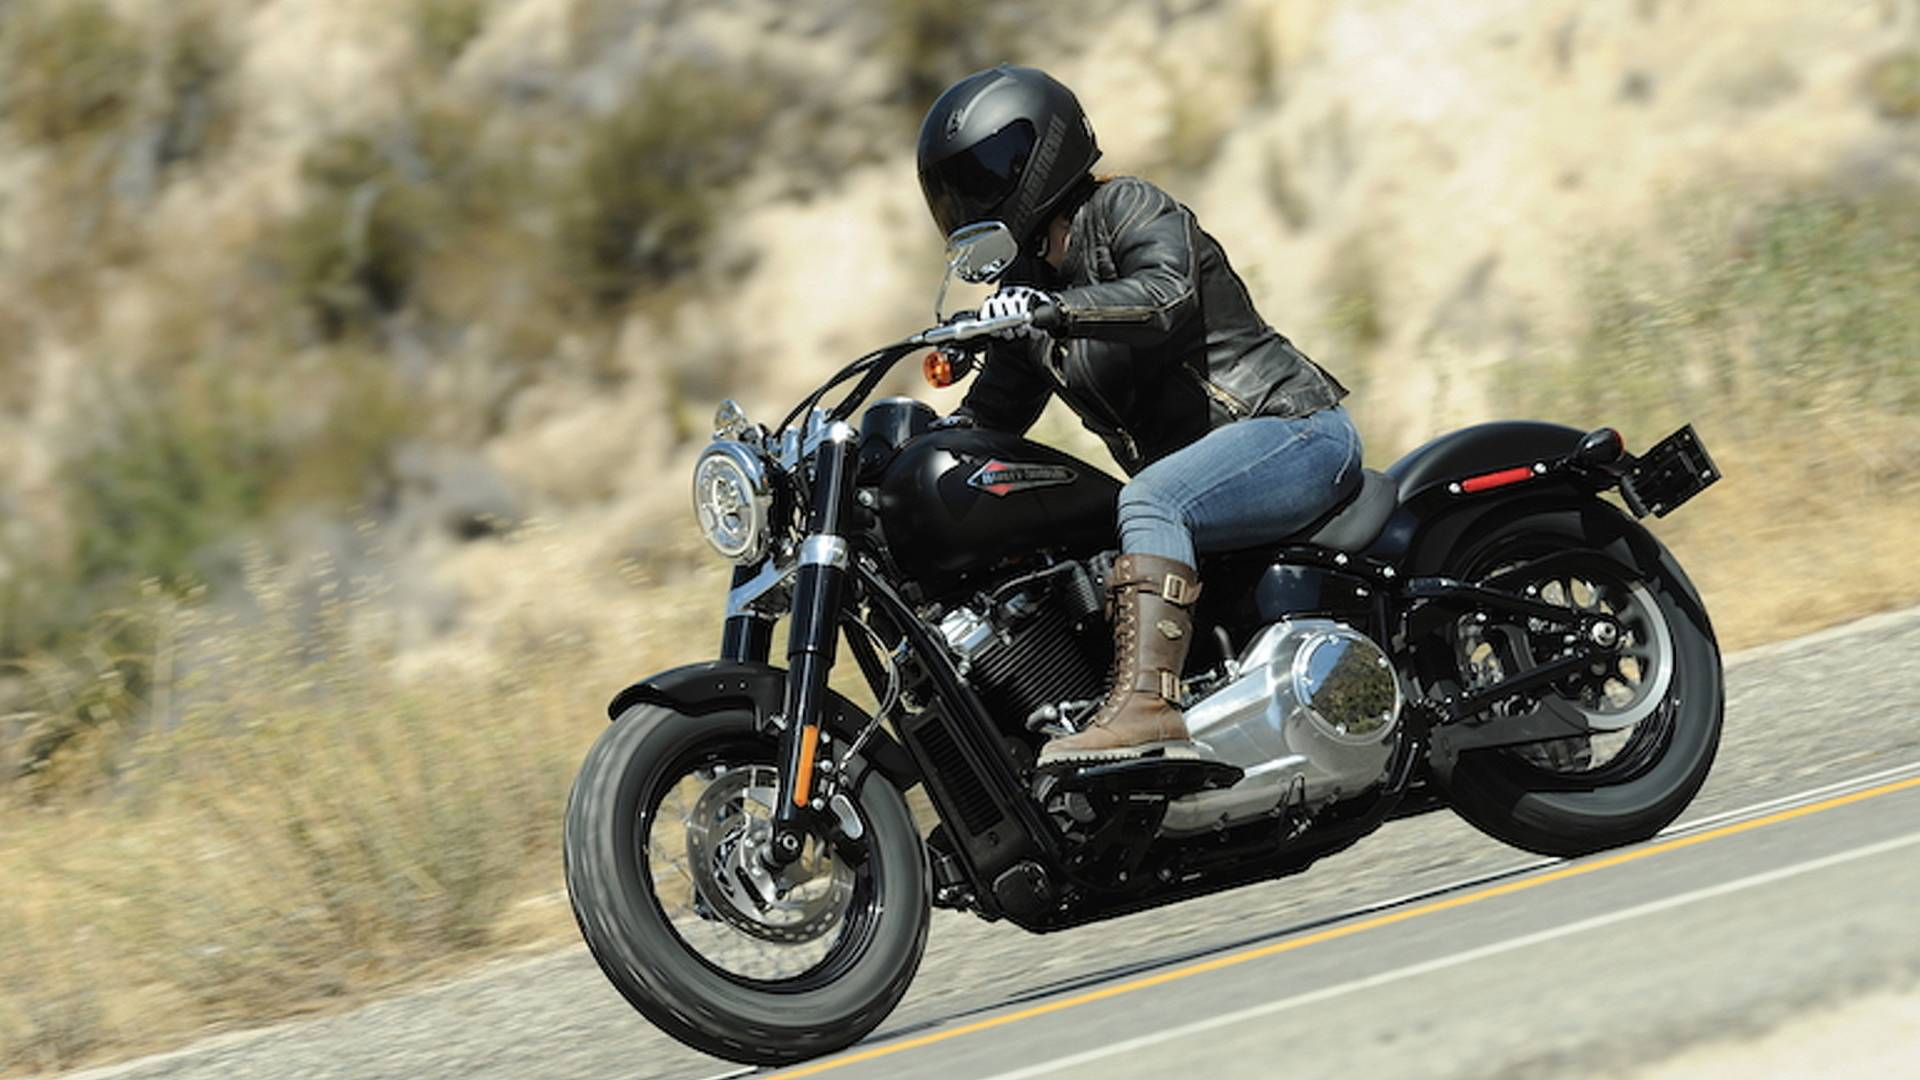 Awe Inspiring First Ride 2018 Harley Davidson Softail Slim Inzonedesignstudio Interior Chair Design Inzonedesignstudiocom